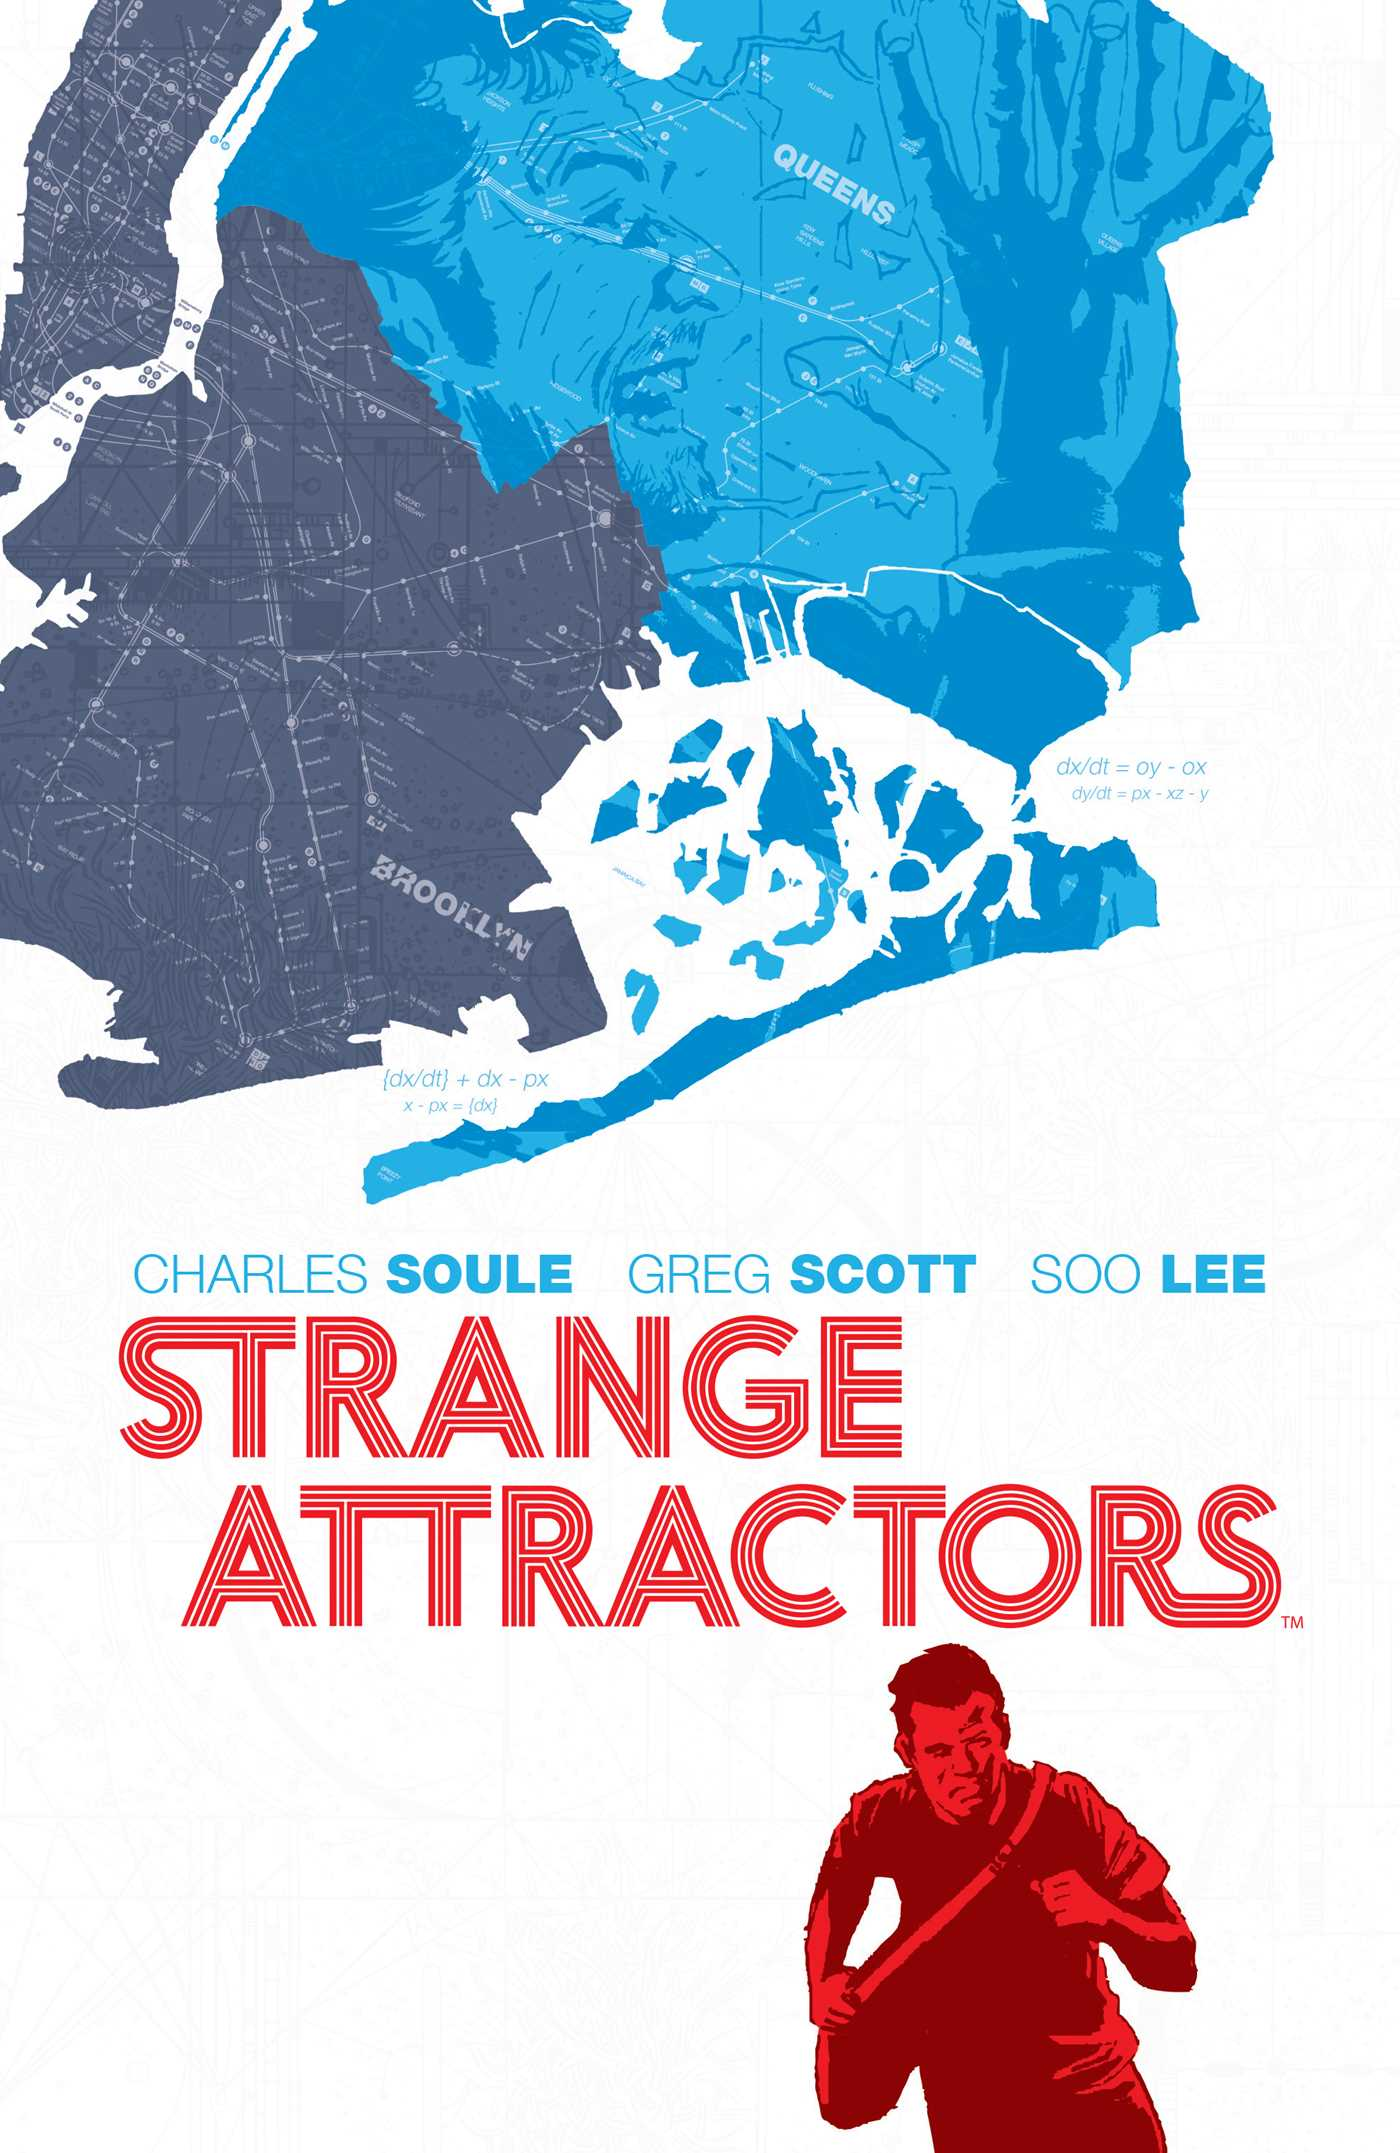 Strange attractors 9781608869763 hr